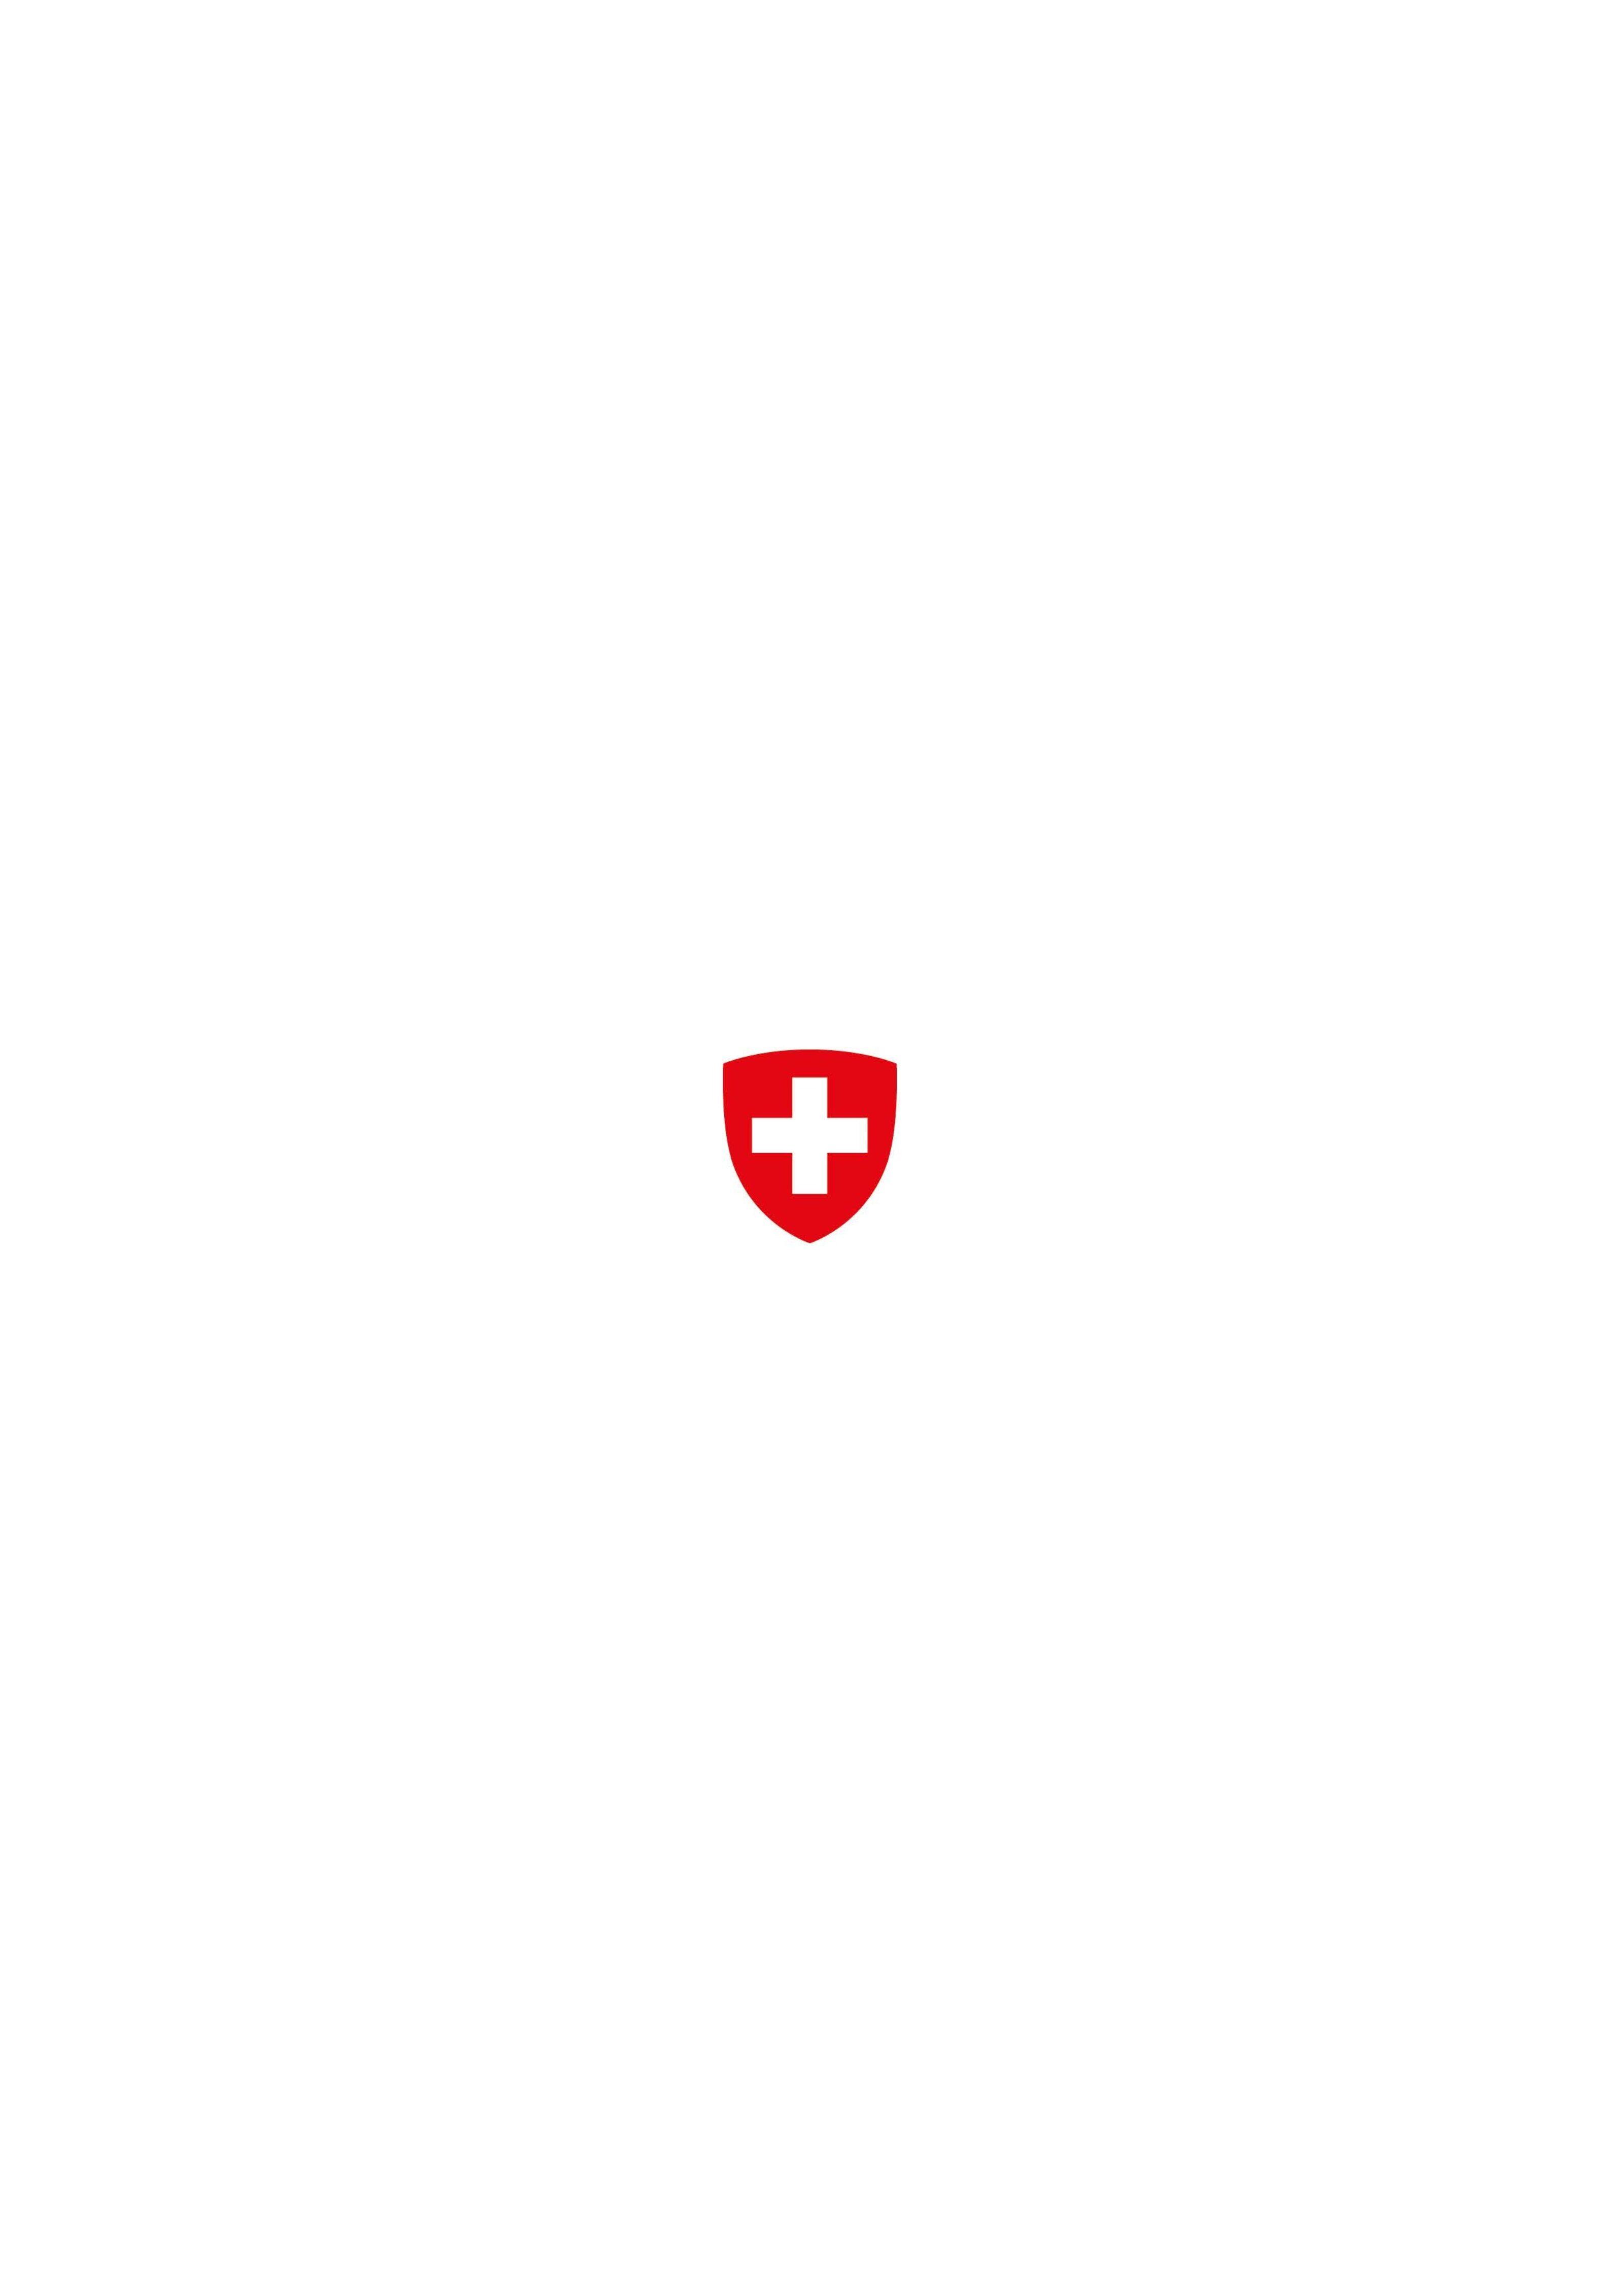 Wappen cmyk 002